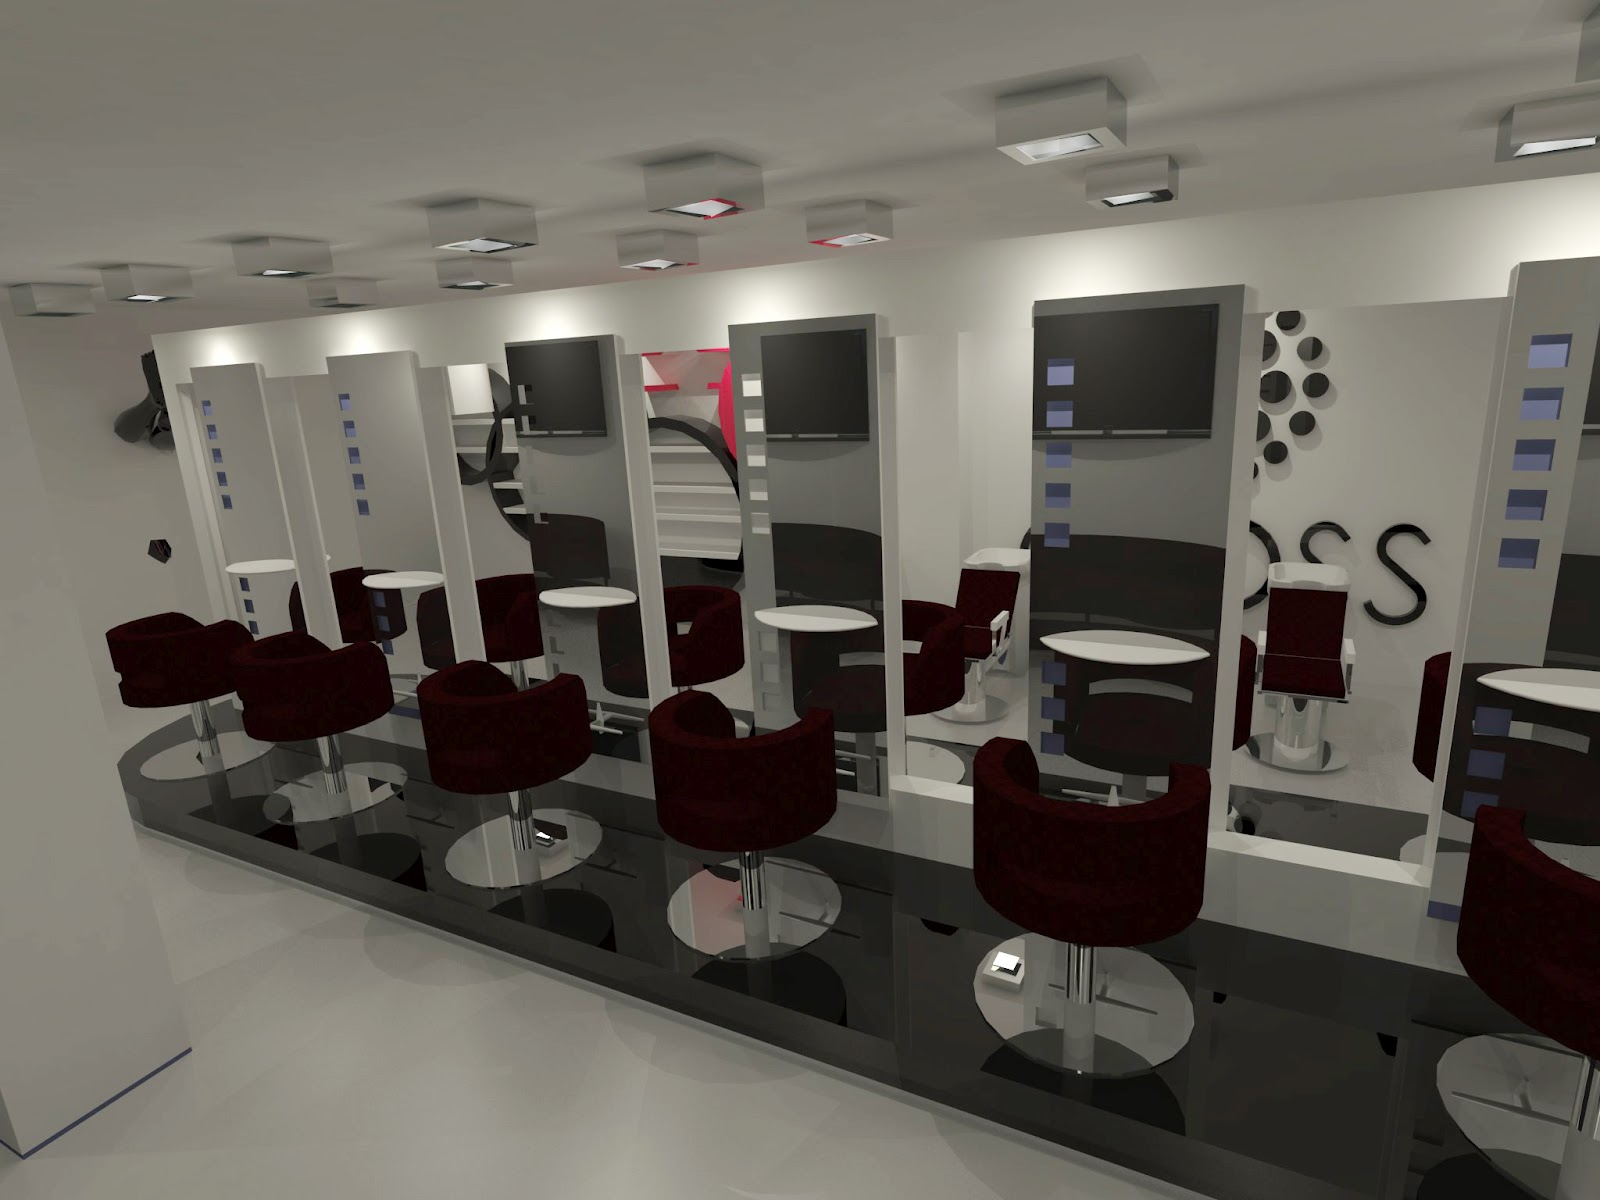 Dise o de interiores escuela de arte de motril sal n de belleza gloss por javier escobar - Interiores de salones ...